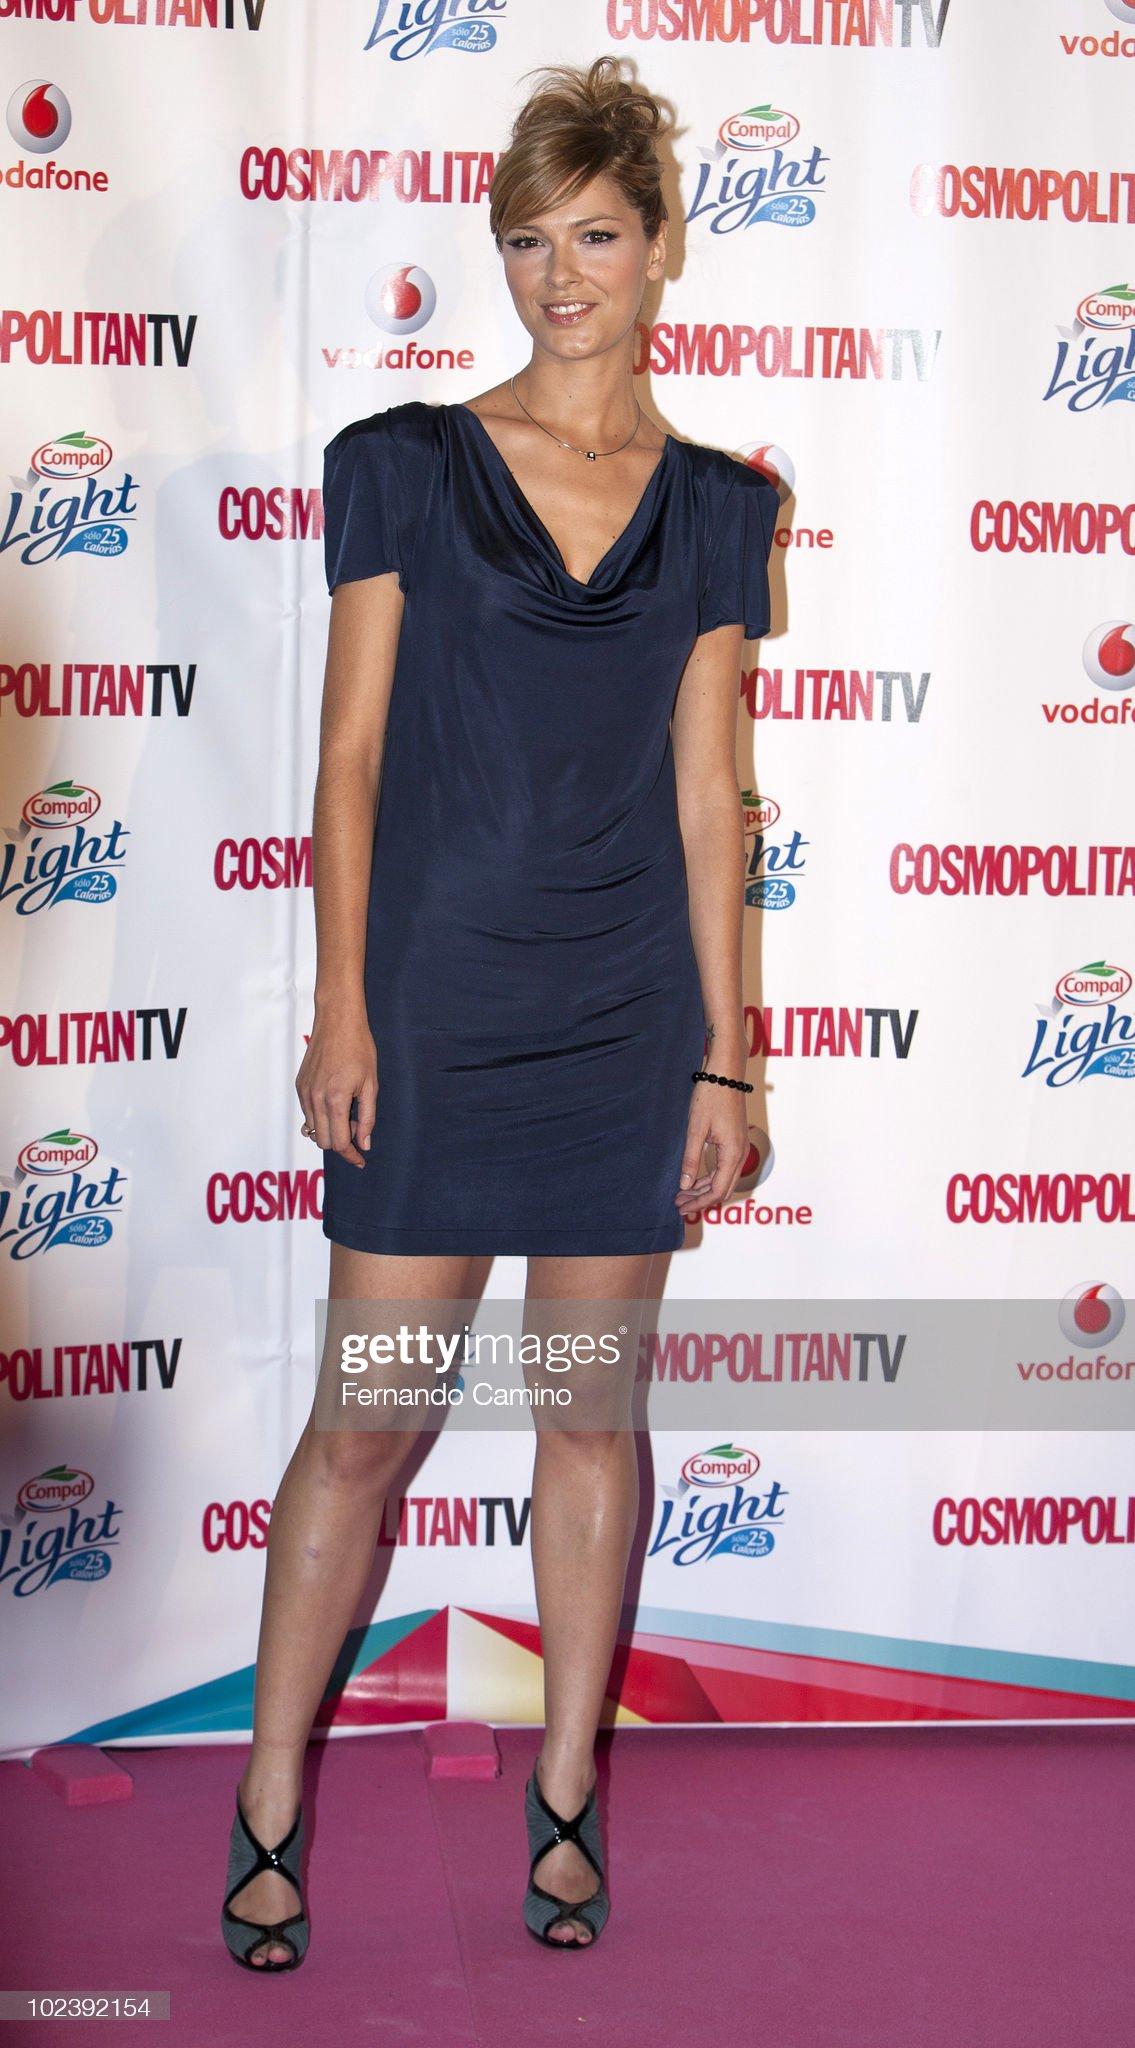 ¿Cuánto mide Cristina Urgel? - Altura Cristina-urgel-attends-the-petalo-awards-photocall-by-cosmopolitan-tv-picture-id102392154?s=2048x2048